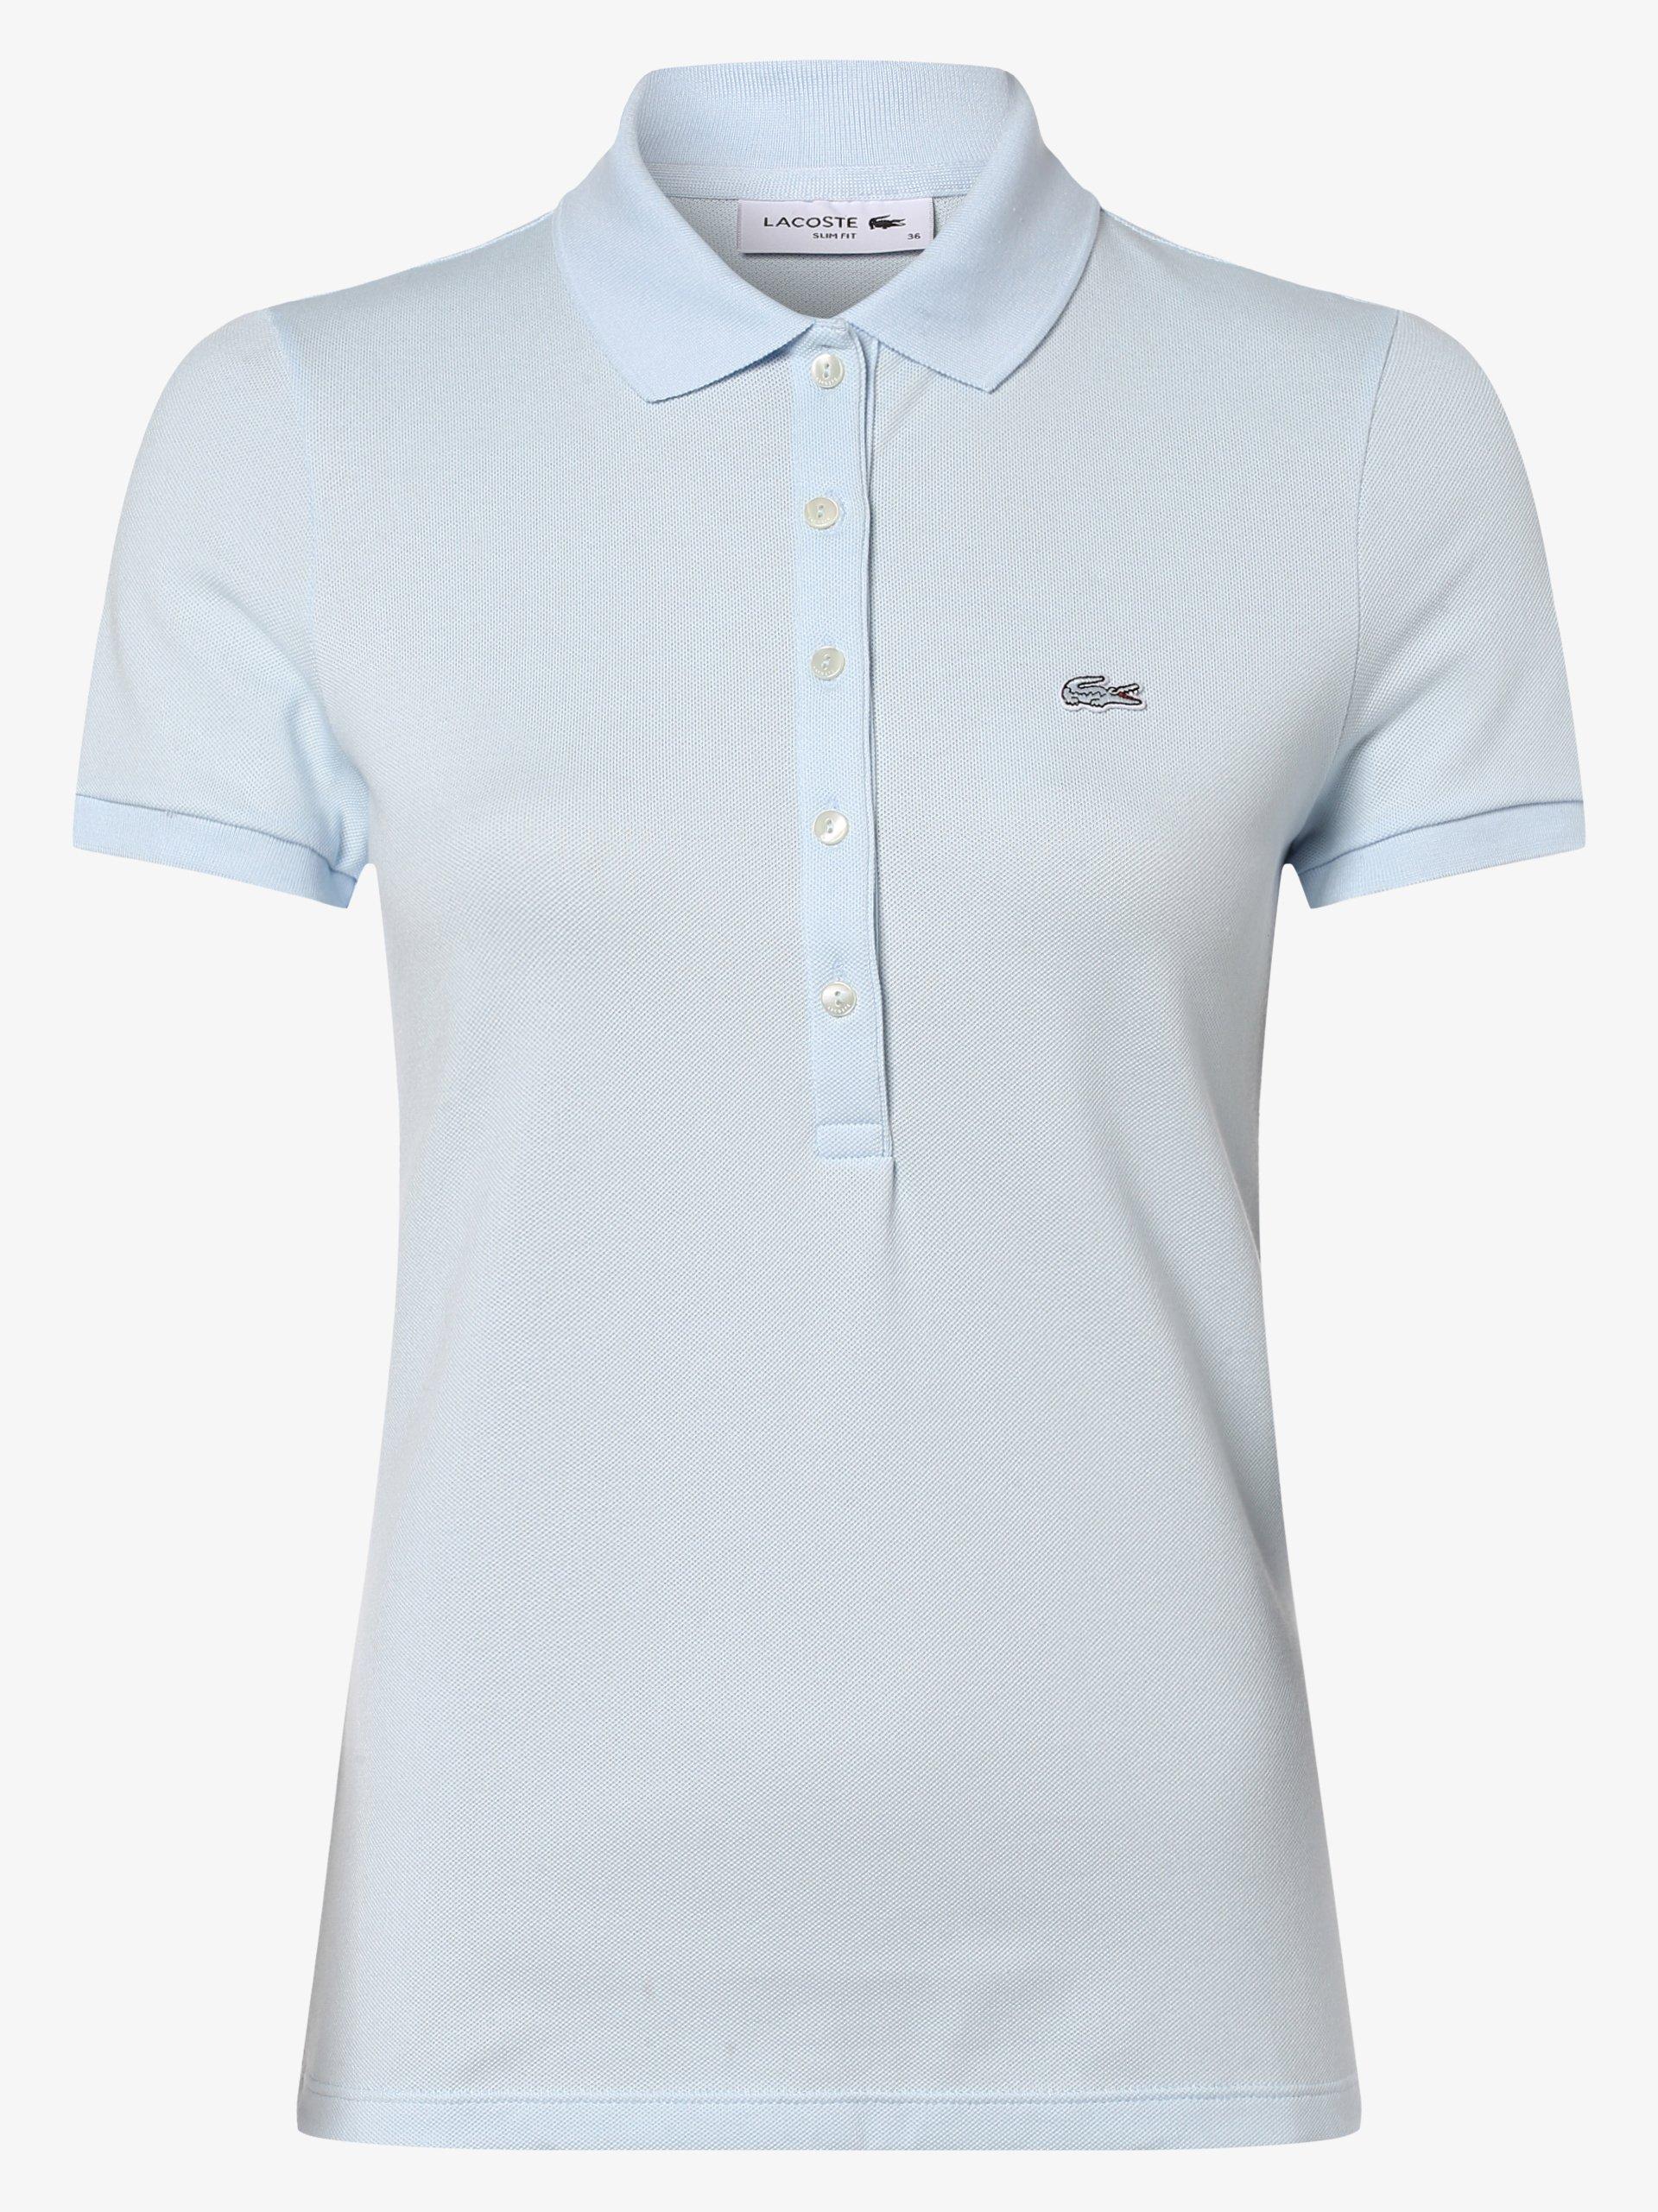 Lacoste Damen Poloshirt